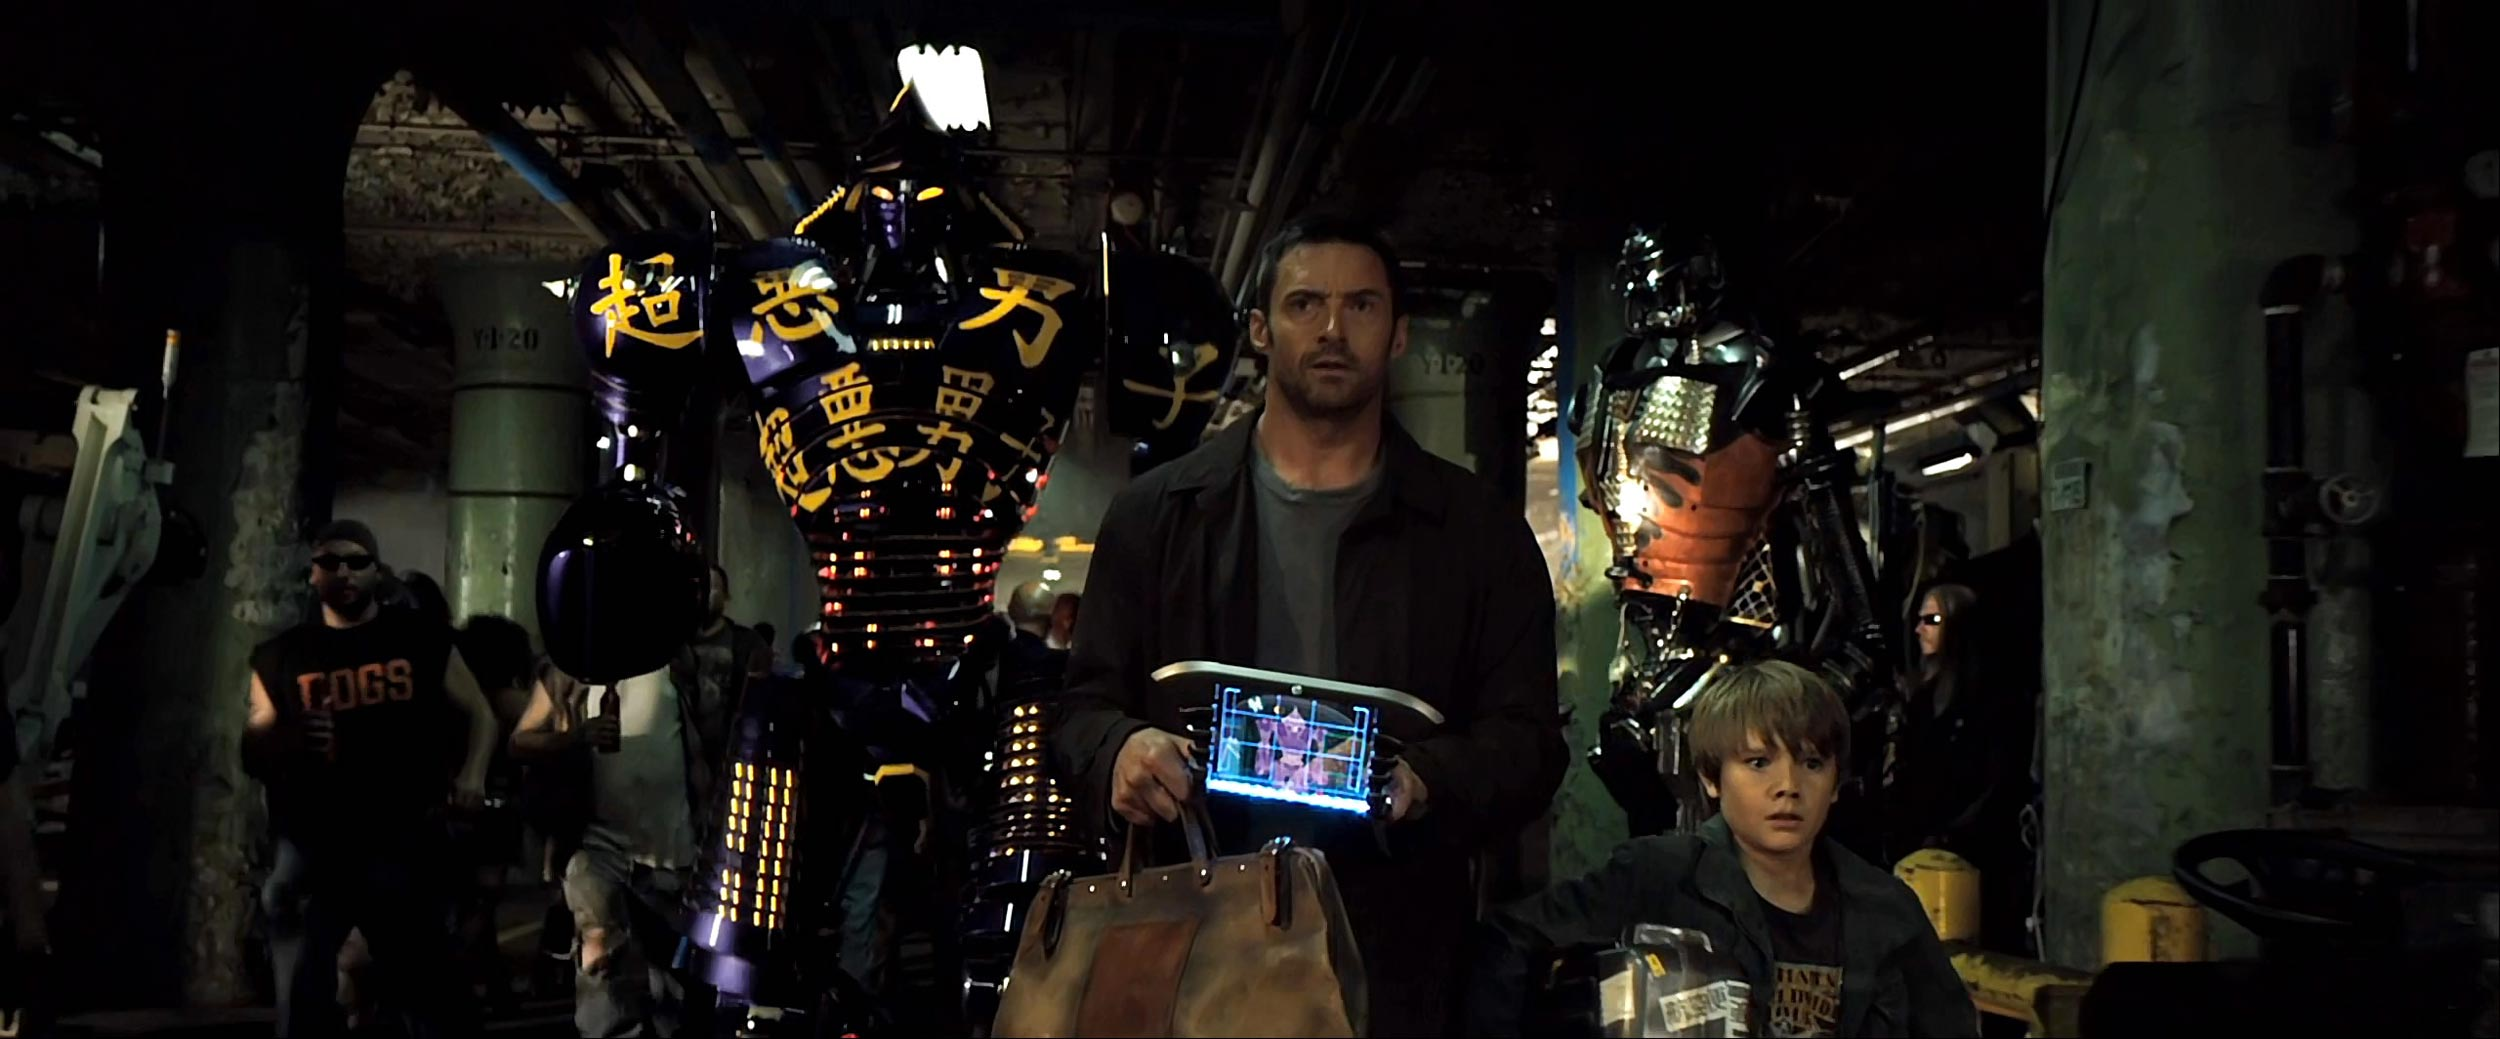 Dakota Goyo and Hugh Jackman in Real Steel